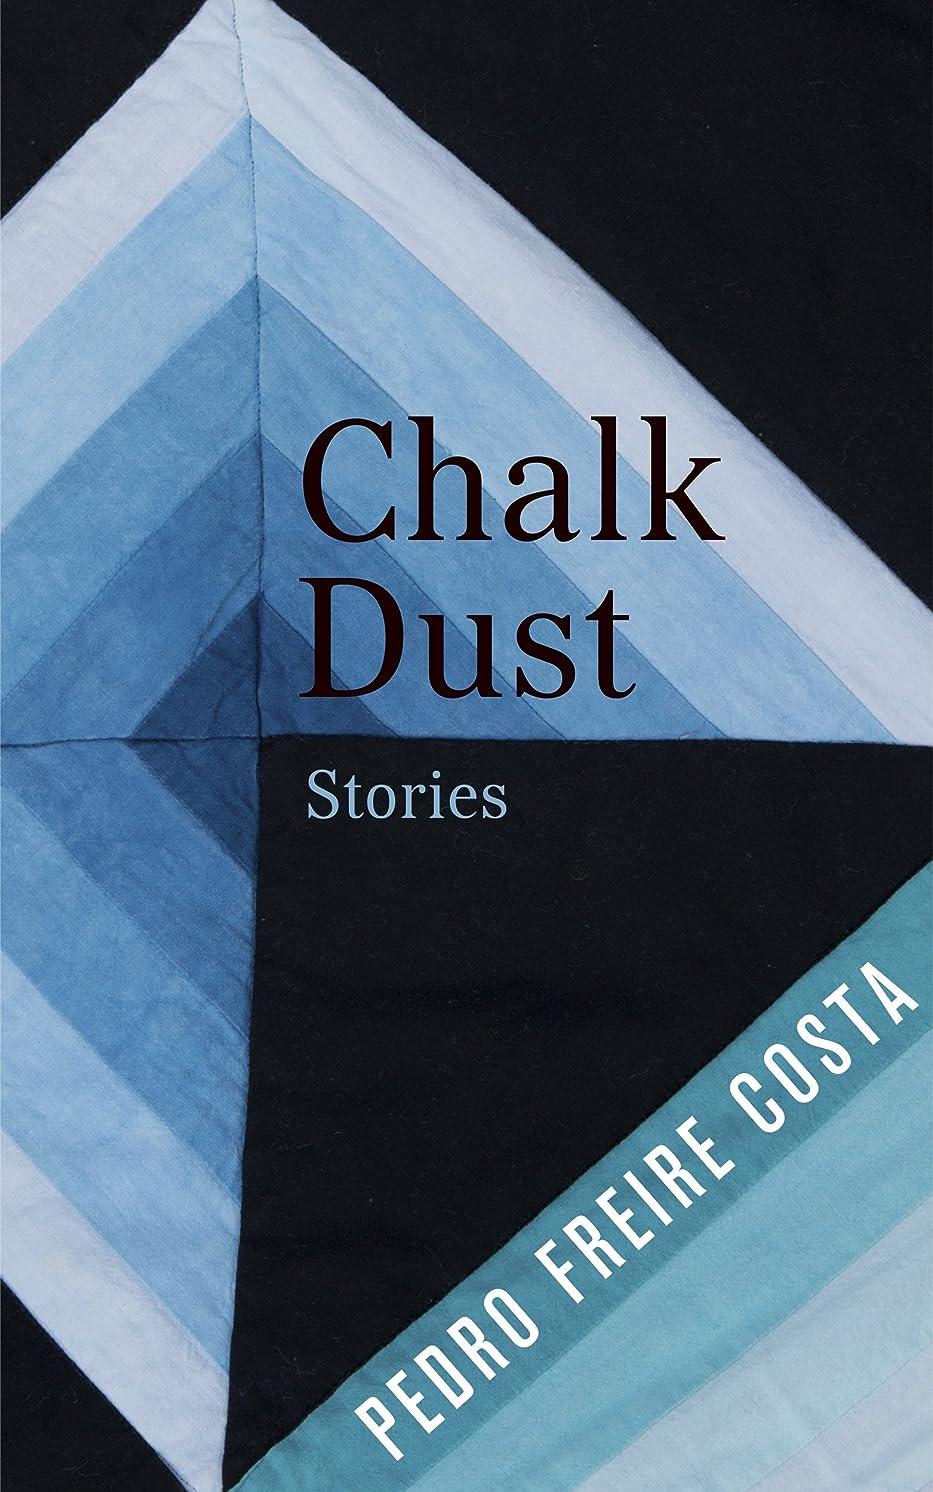 Chalk Dust: Stories